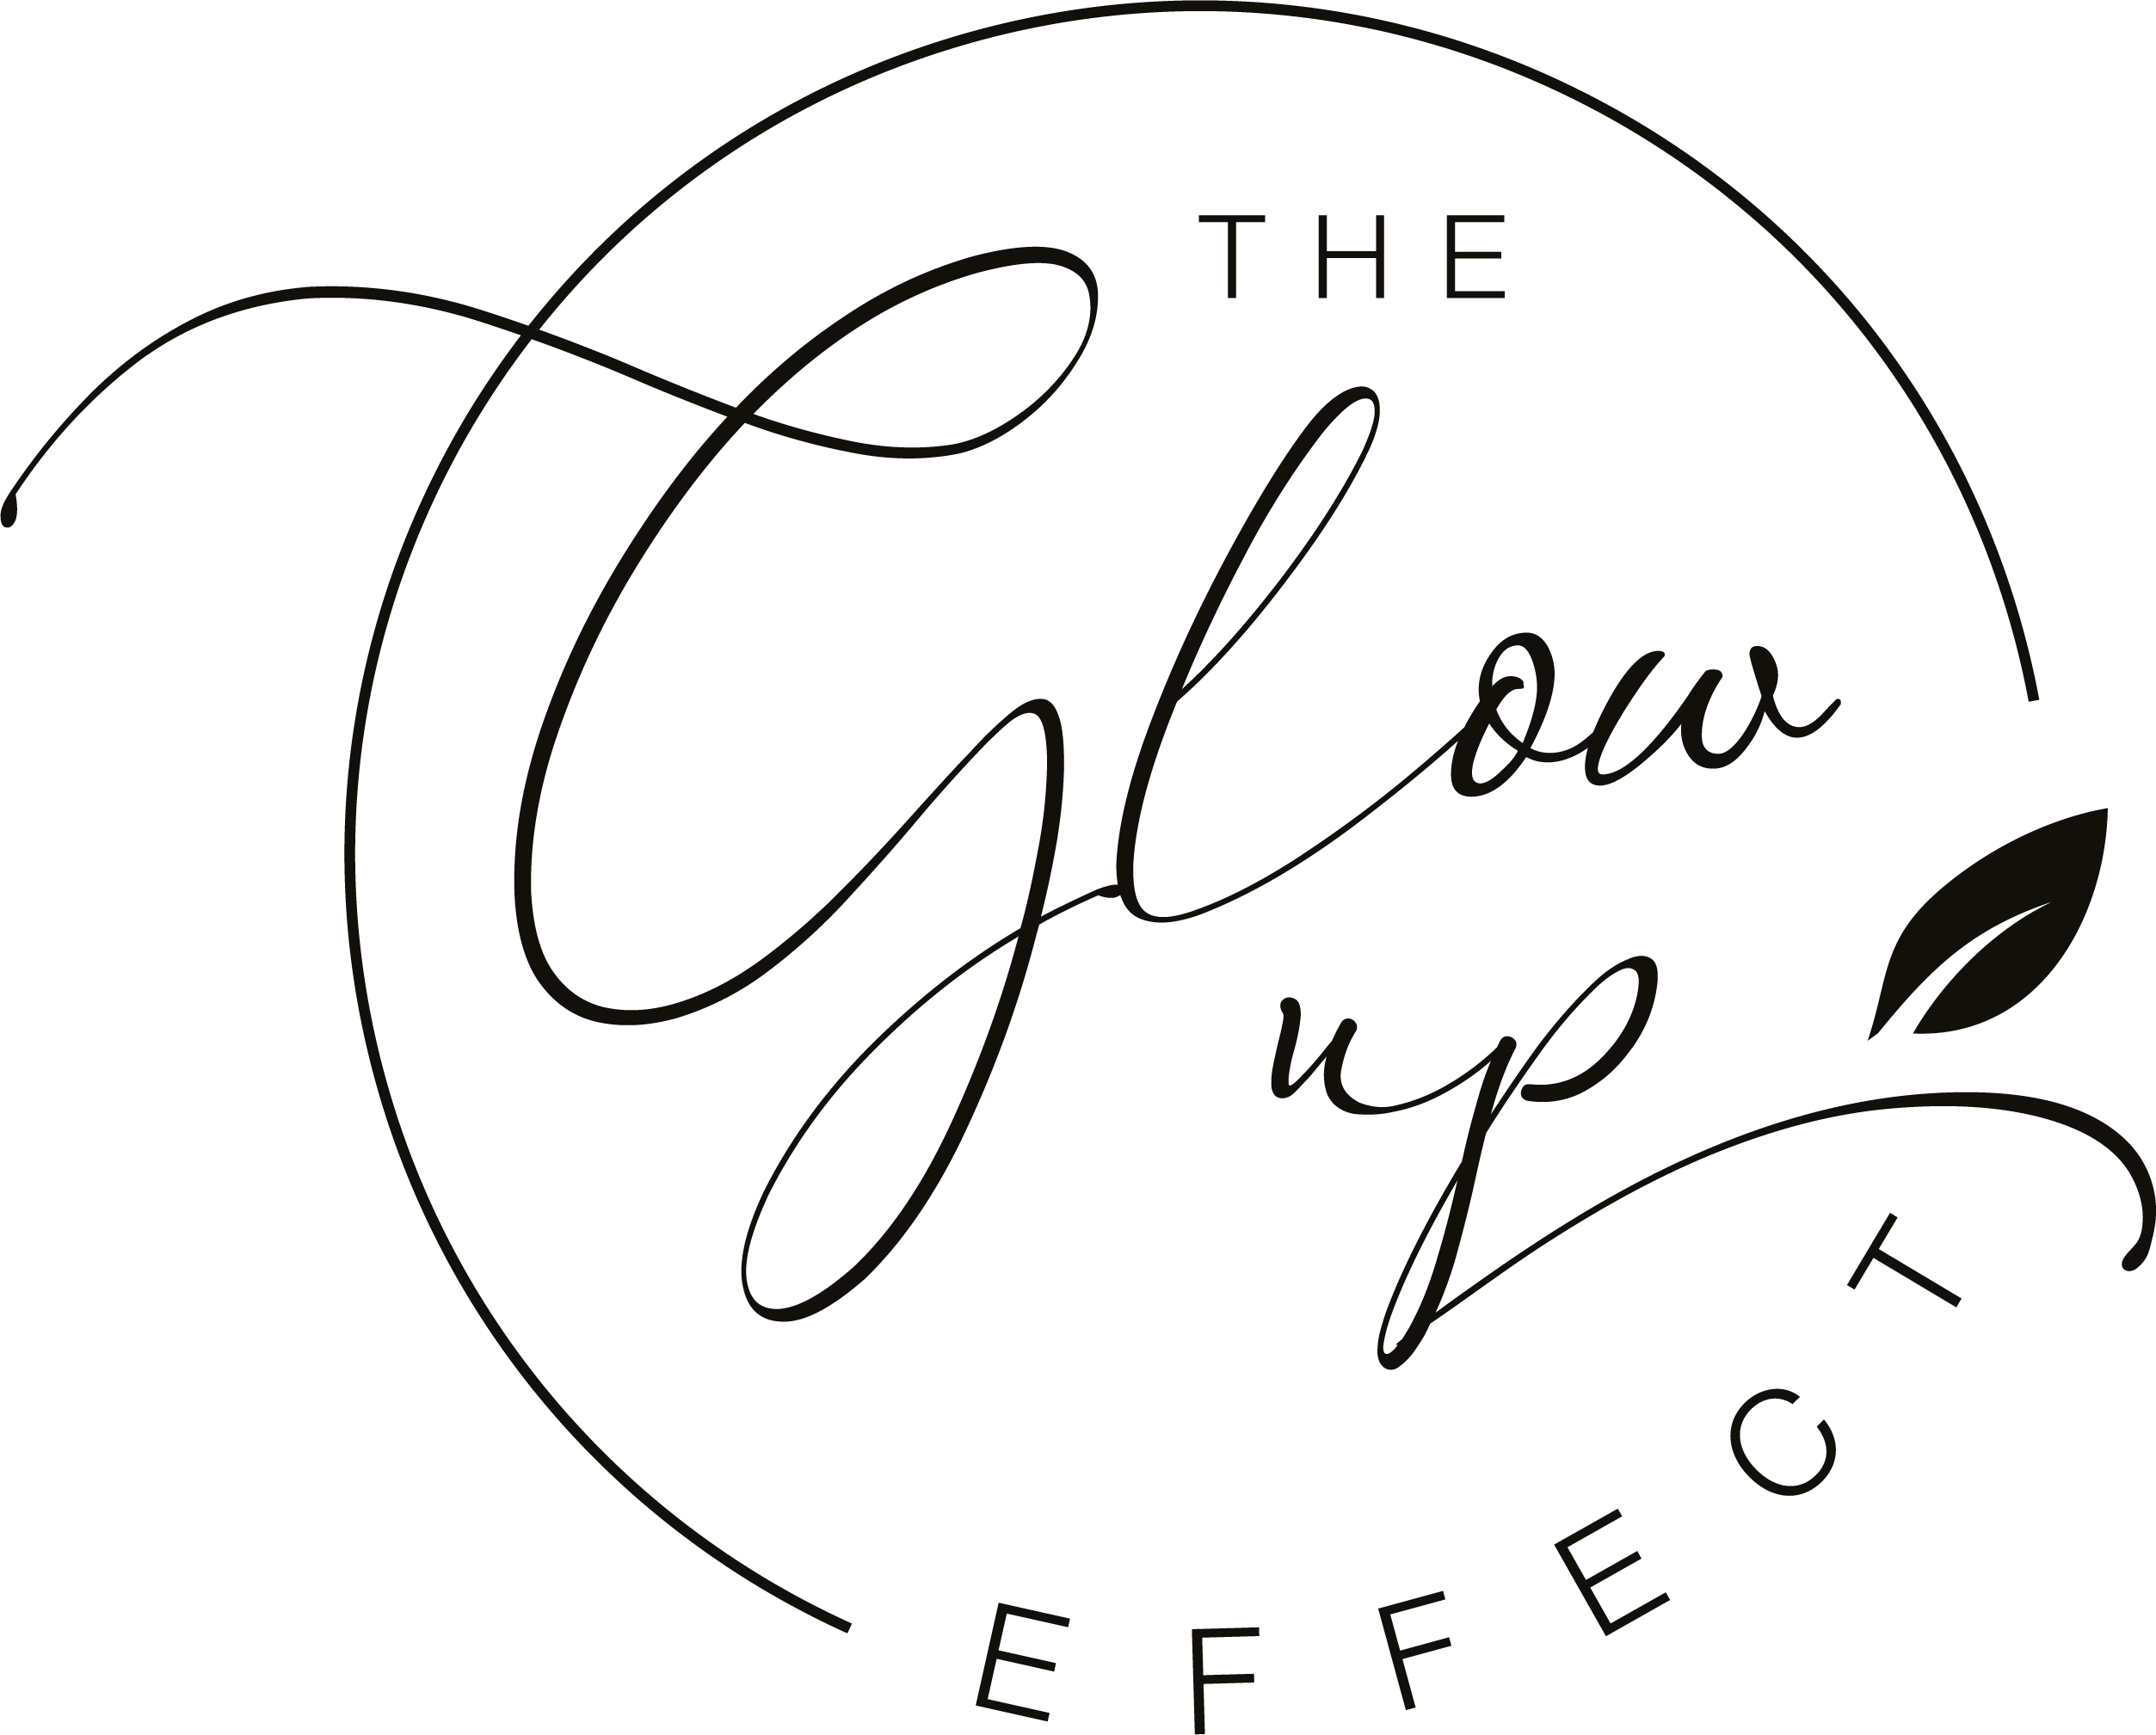 Sleek, clean GLOWING logo for a social media influencer brand